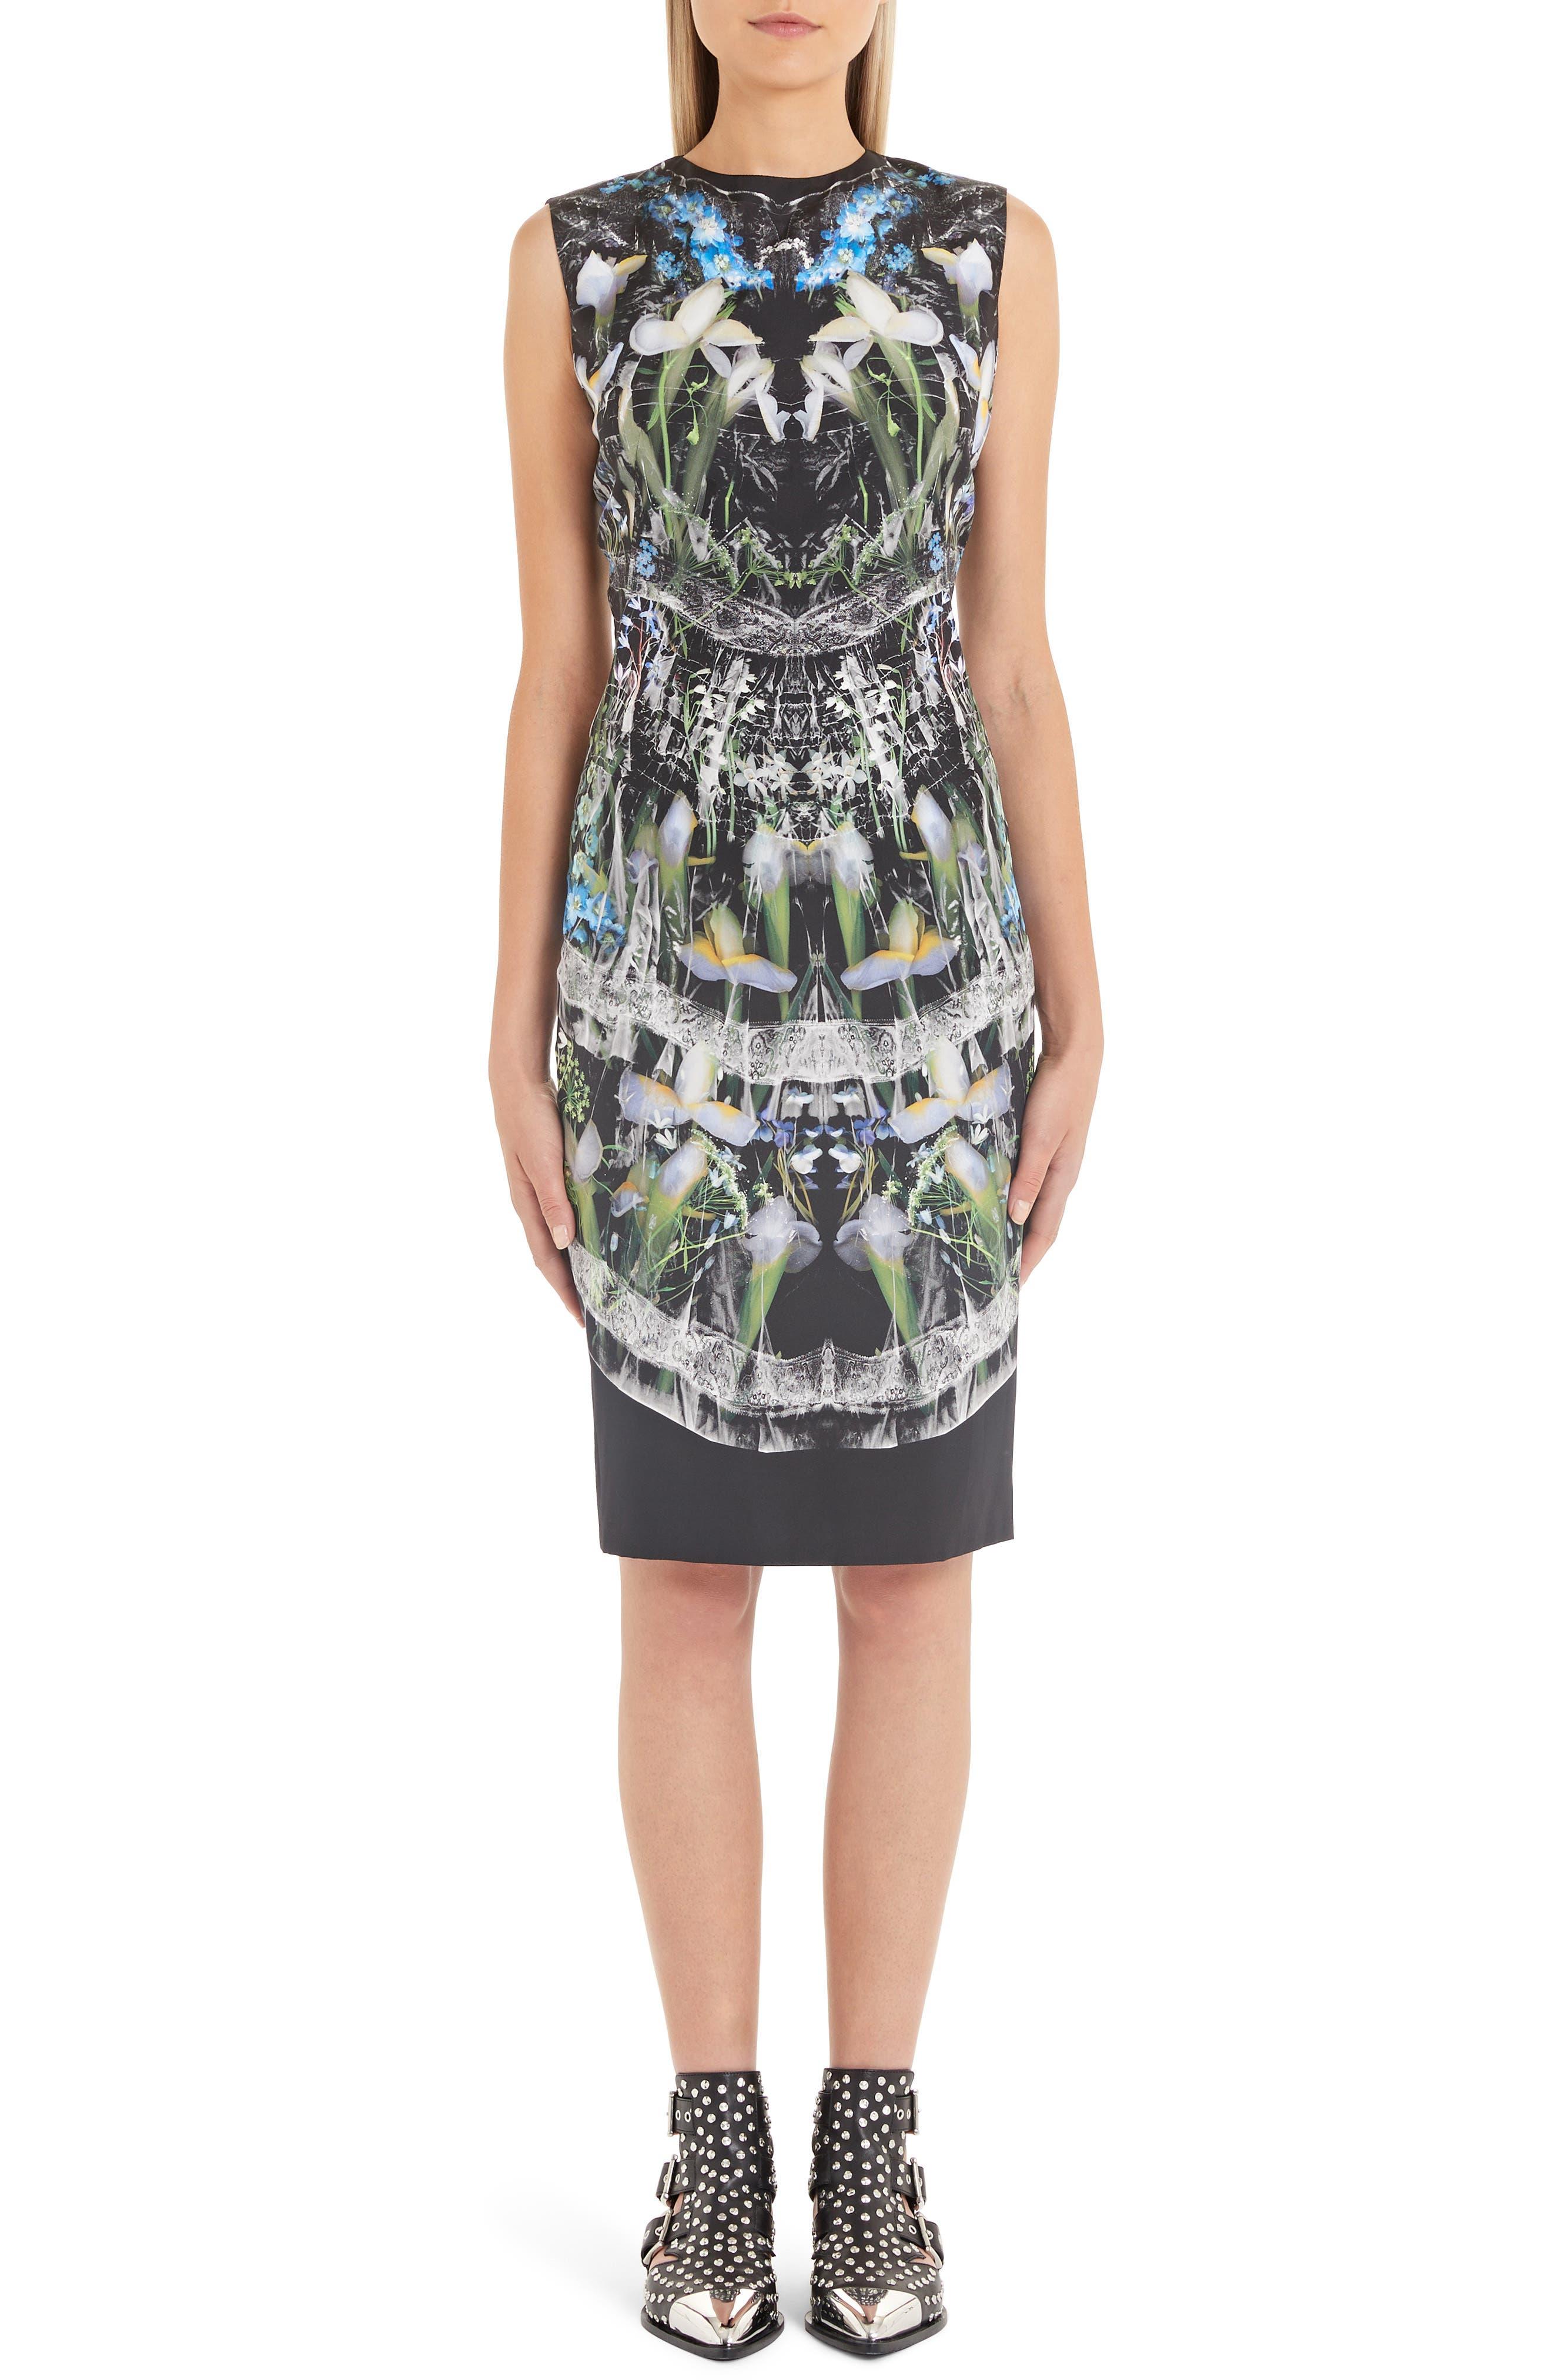 Alexander Mcqueen Ophelia Floral Print Silk Pencil Dress, US / 42 IT - Black